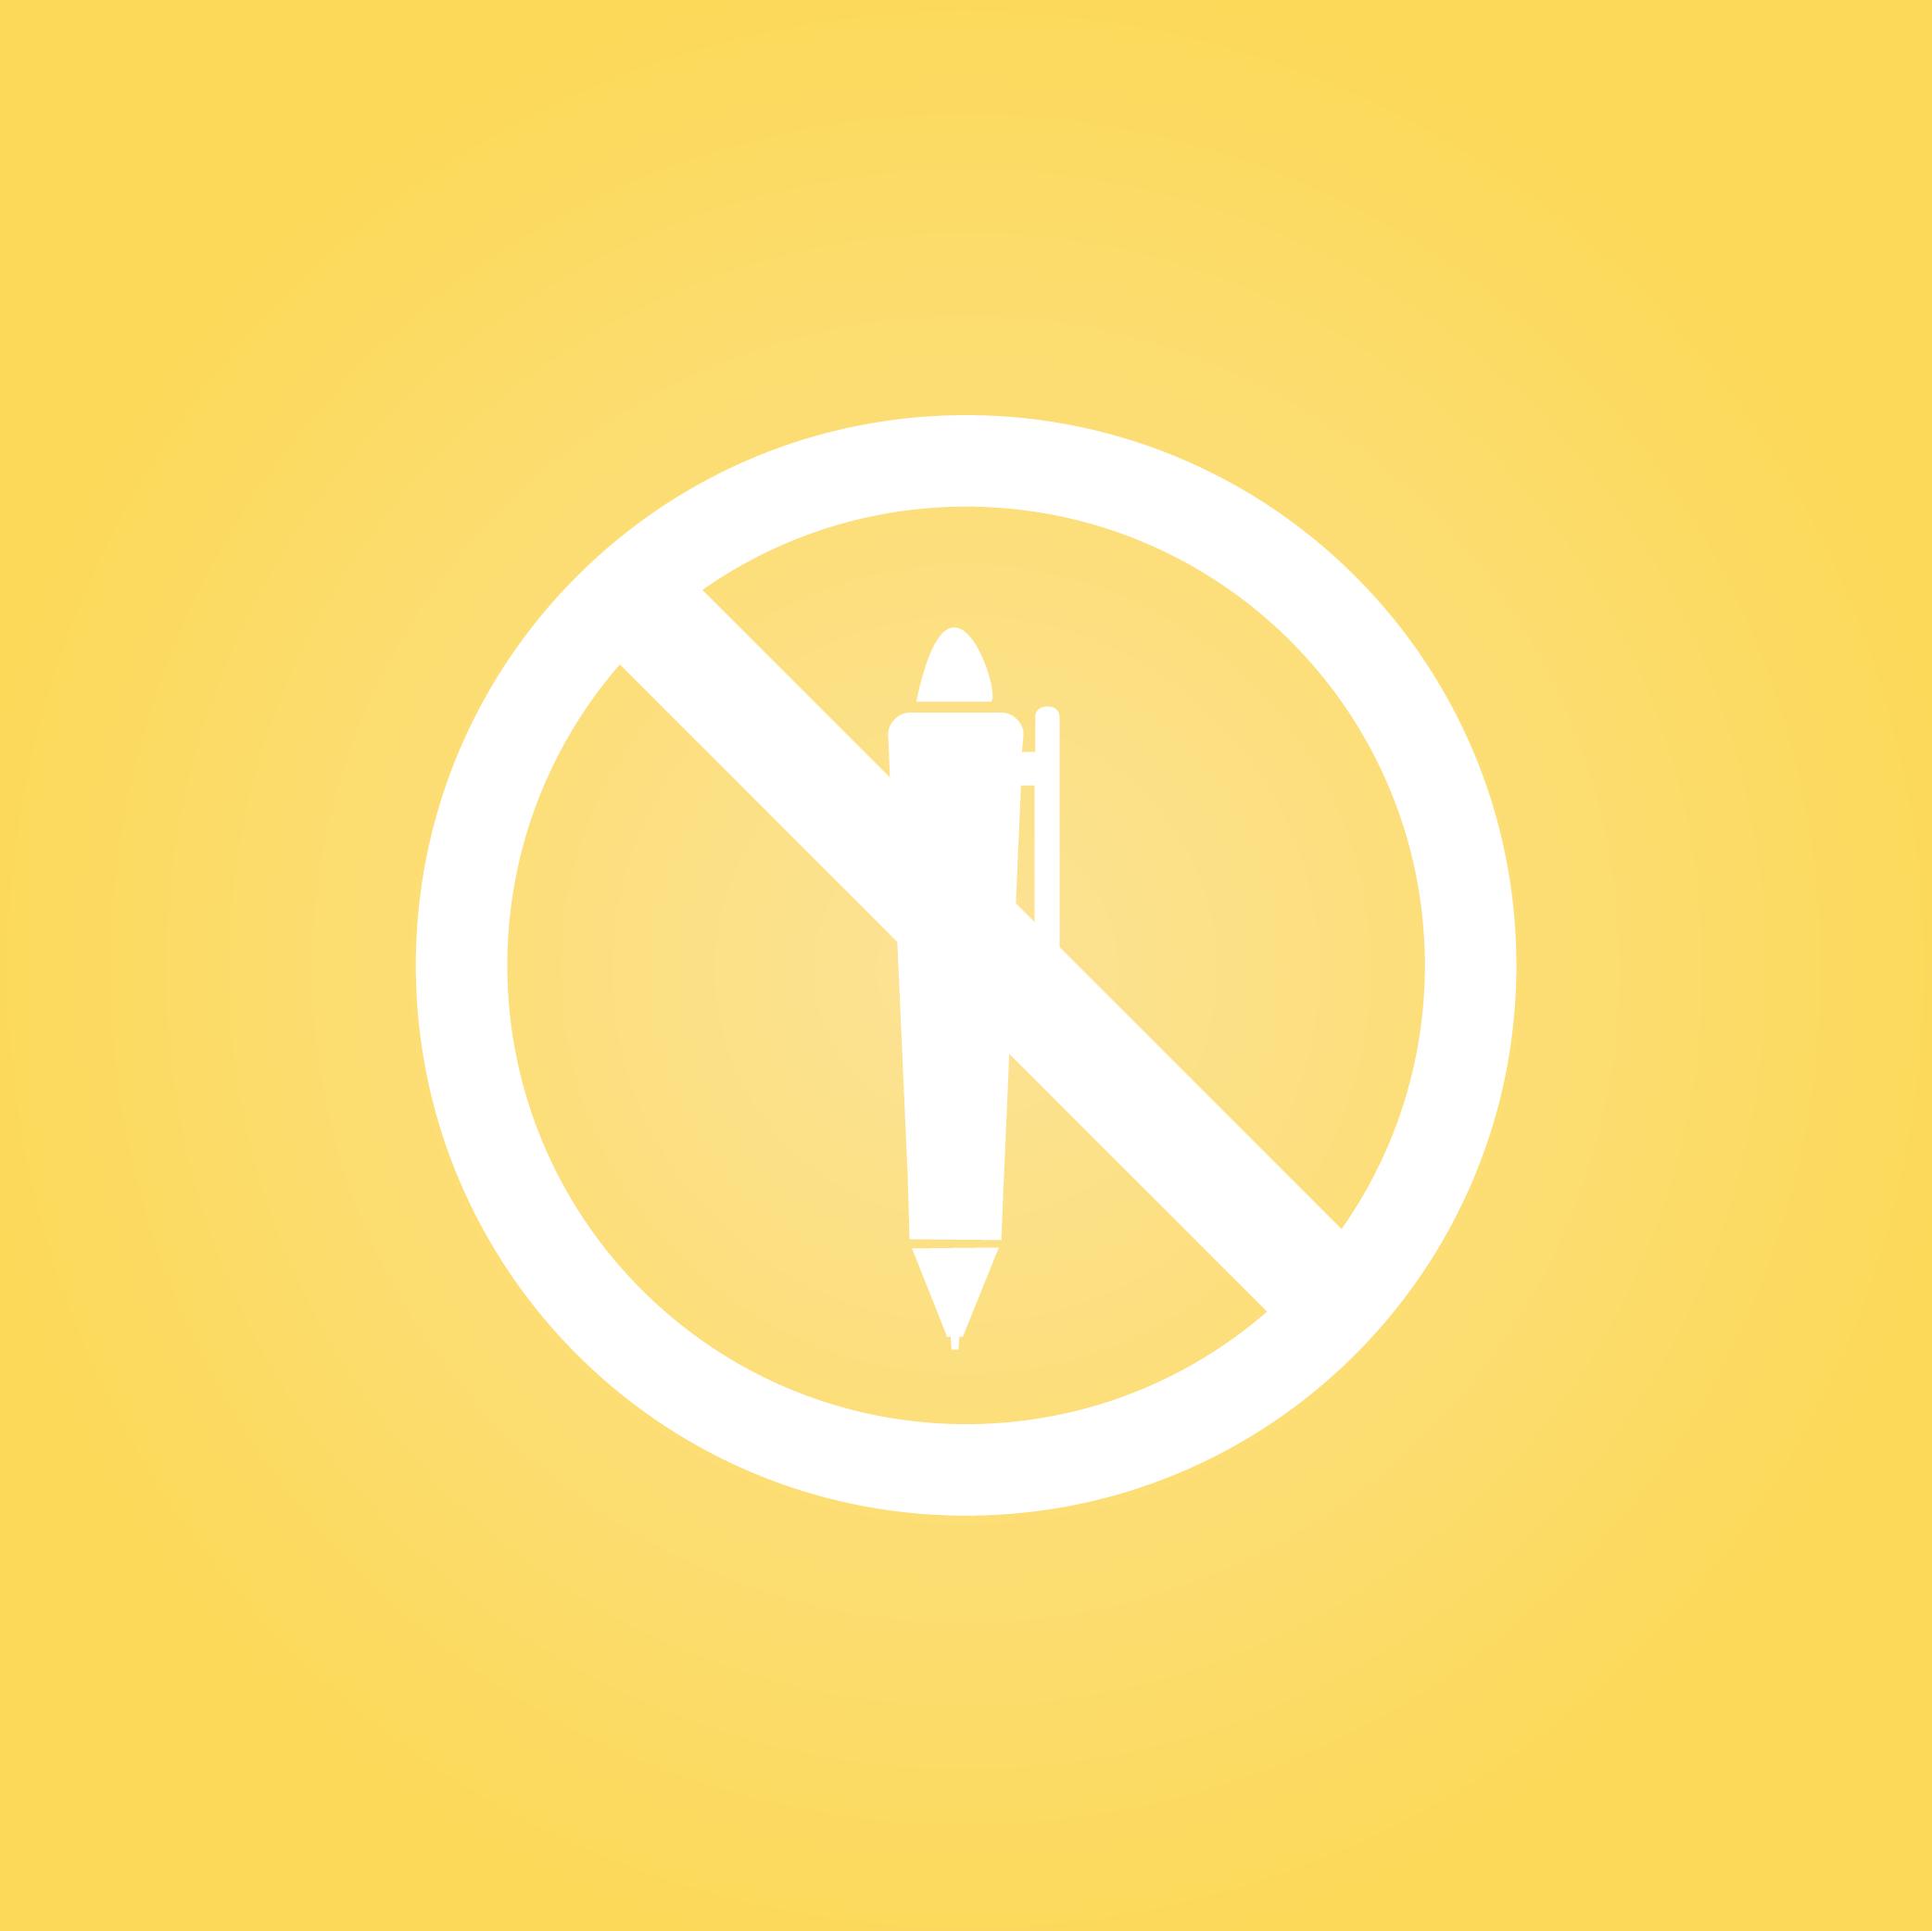 Copy_Buffs_copywriting_mistakes-01.png